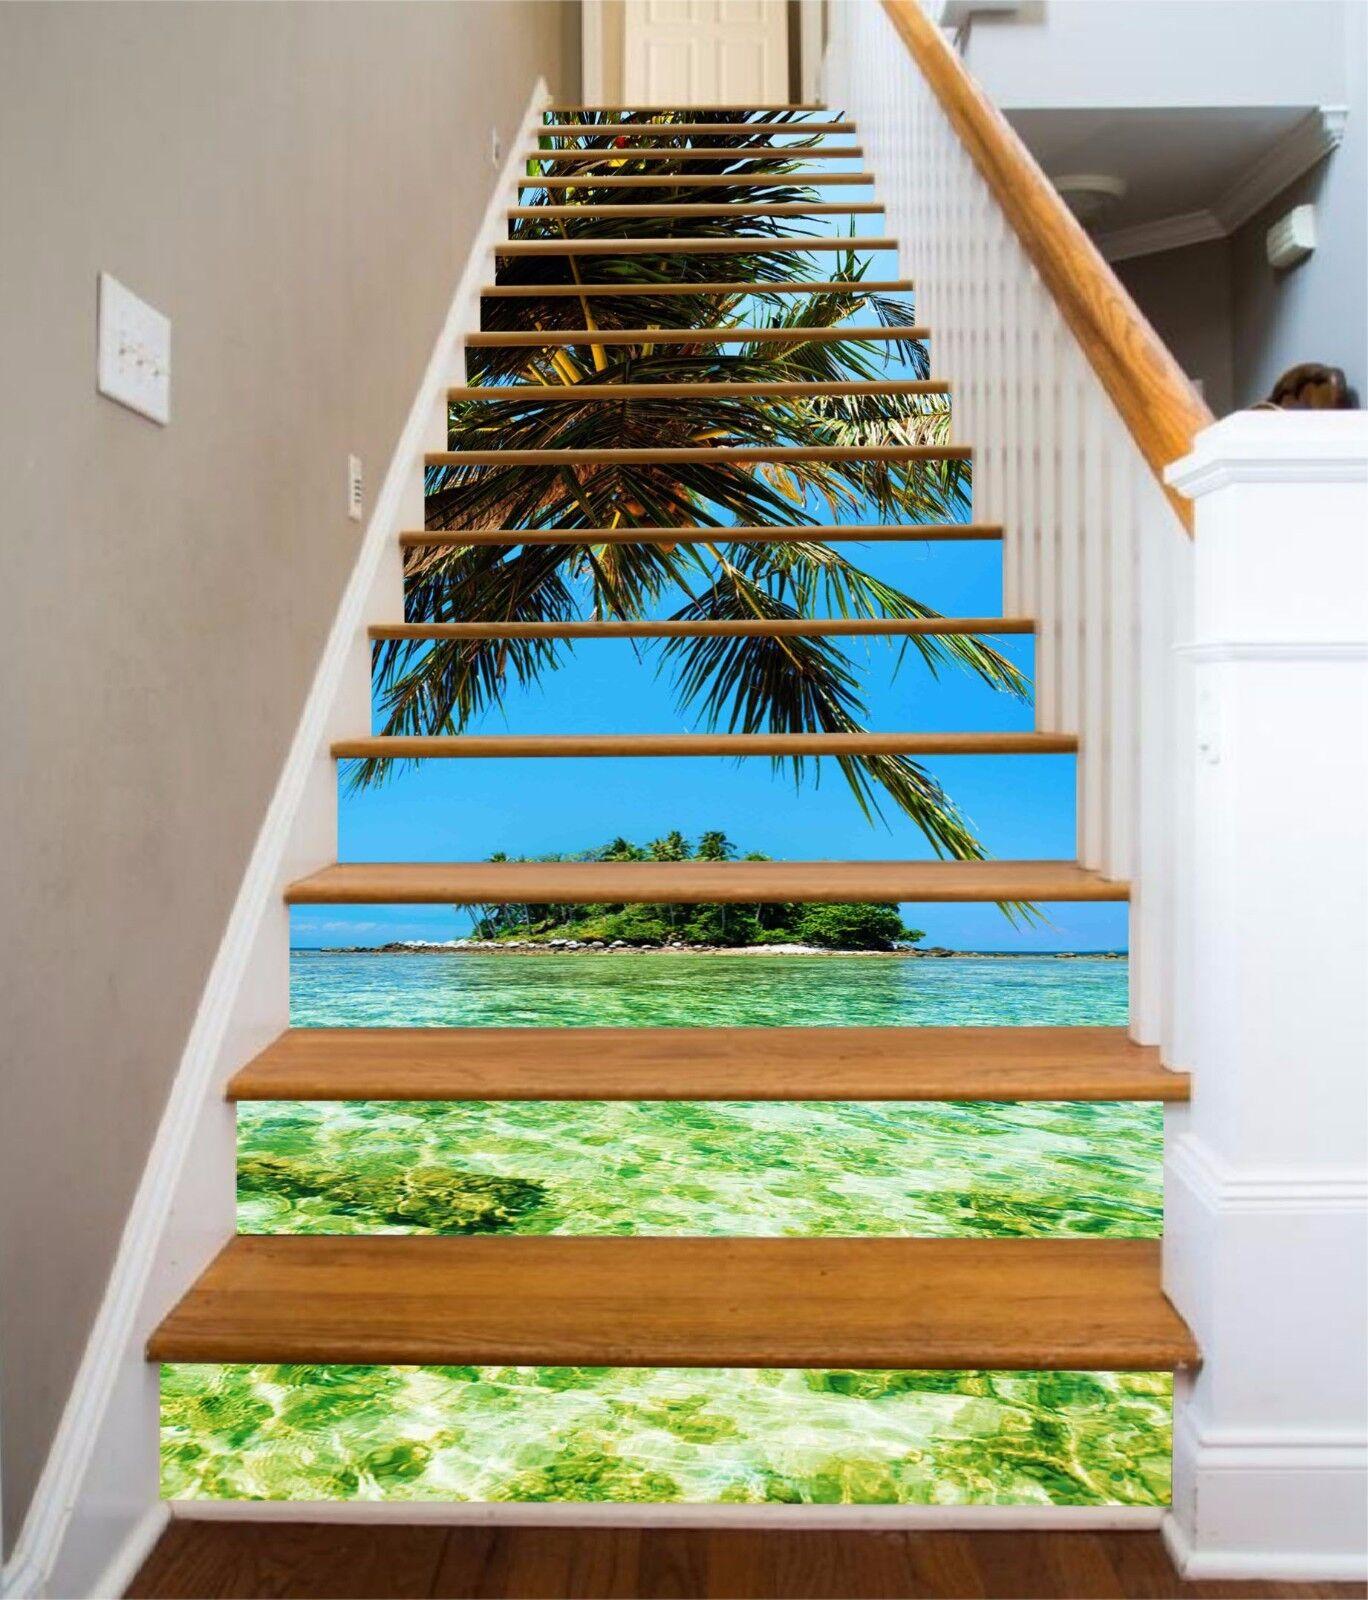 3D Inseln Baum 836 Stair Risers Dekoration Fototapete Vinyl Aufkleber Tapete DE